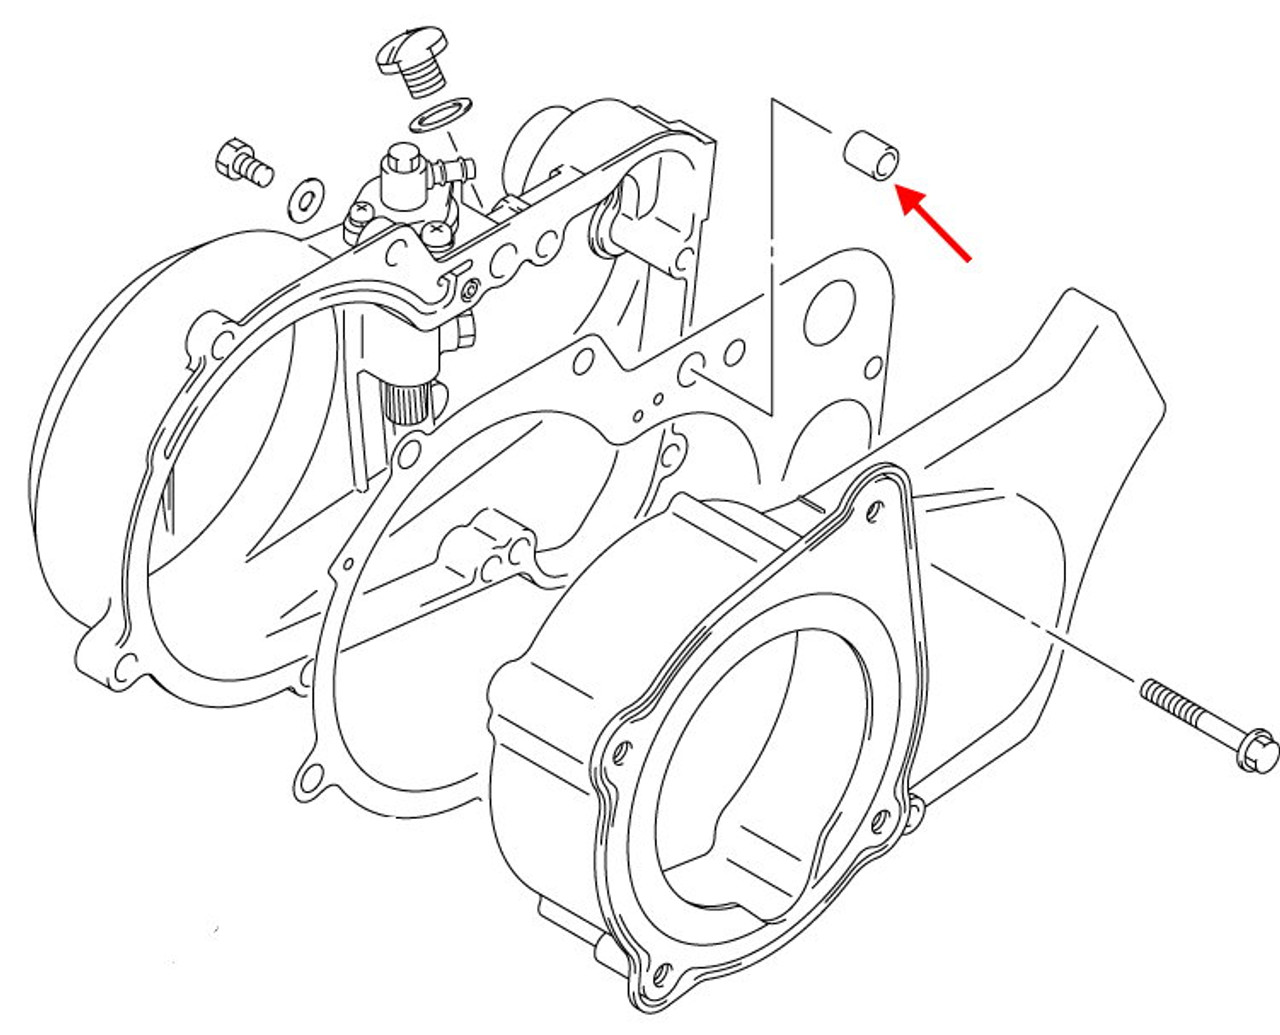 Suzuki Oem Clutch Cover Dowel Gs1100gs1150 0421109129: Roaring Toyz Wiring Diagram At Teydeco.co